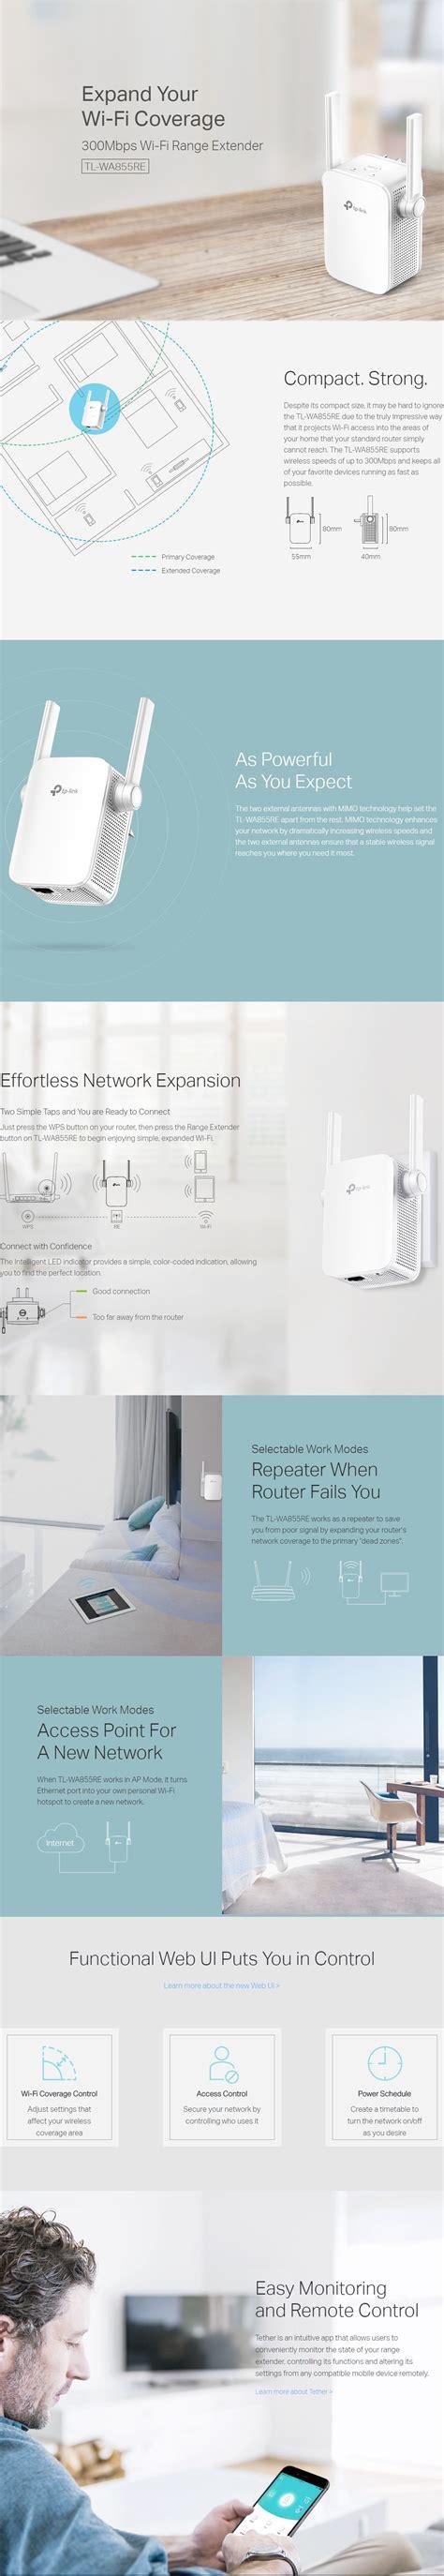 New Tp Link Tl Wa855re 300mbps Wi Fi Range Extender Bagus tp link tl wa855re 300mbps wi fi range extender tl wa855re